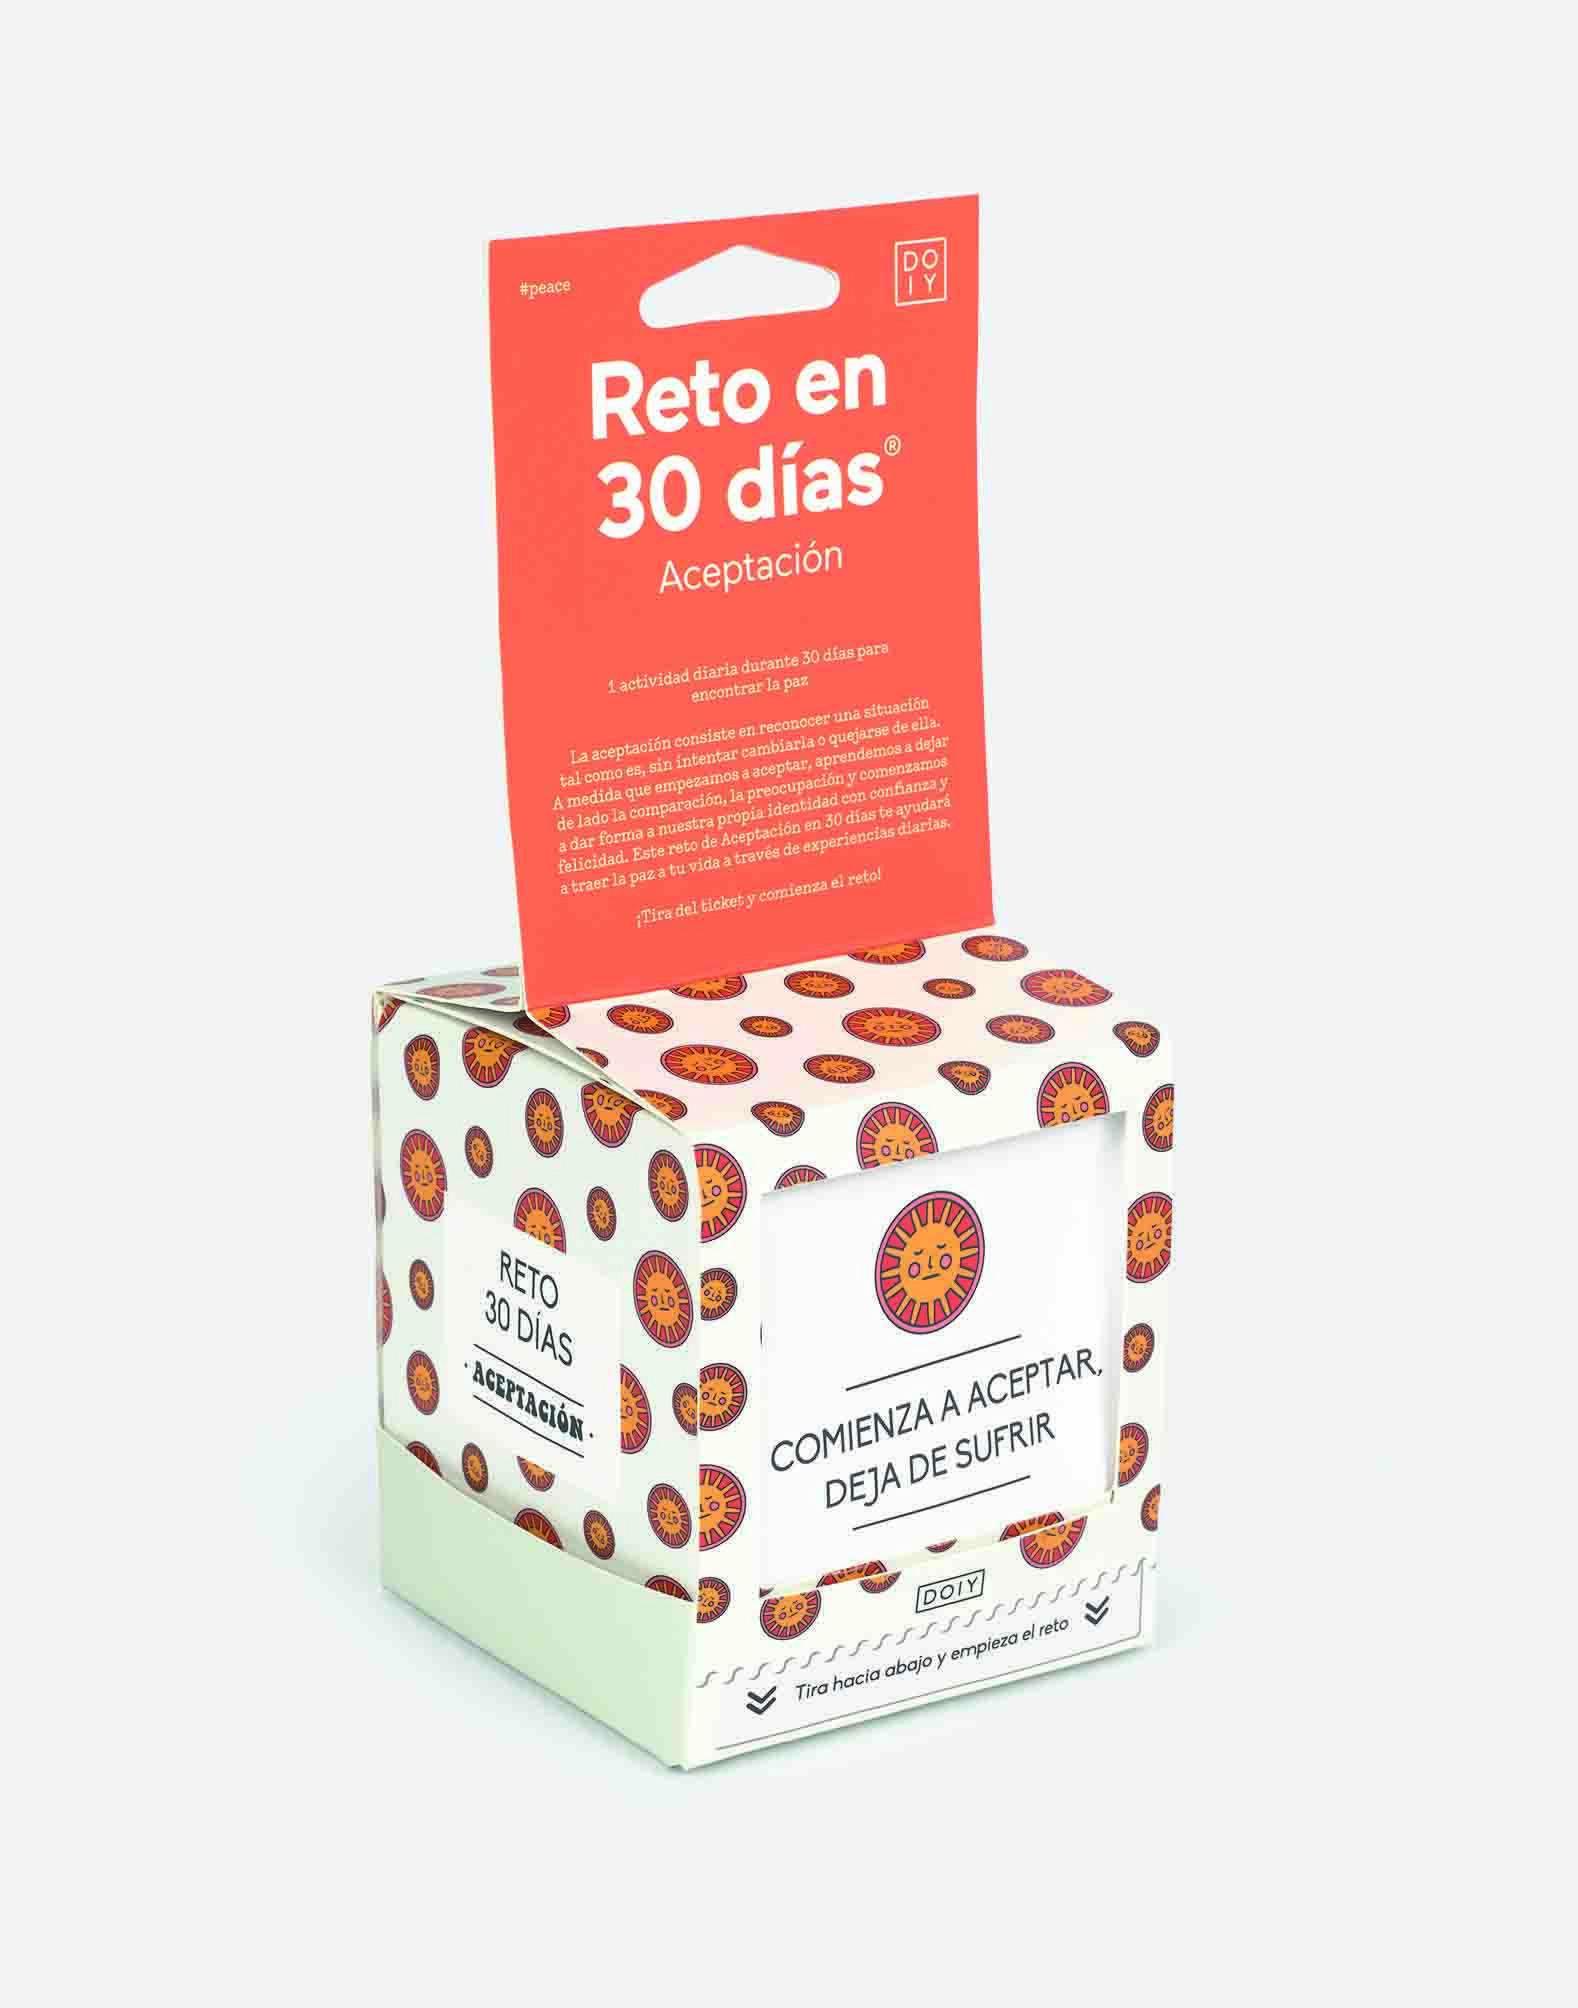 30 day challenge acceptance (spanish)